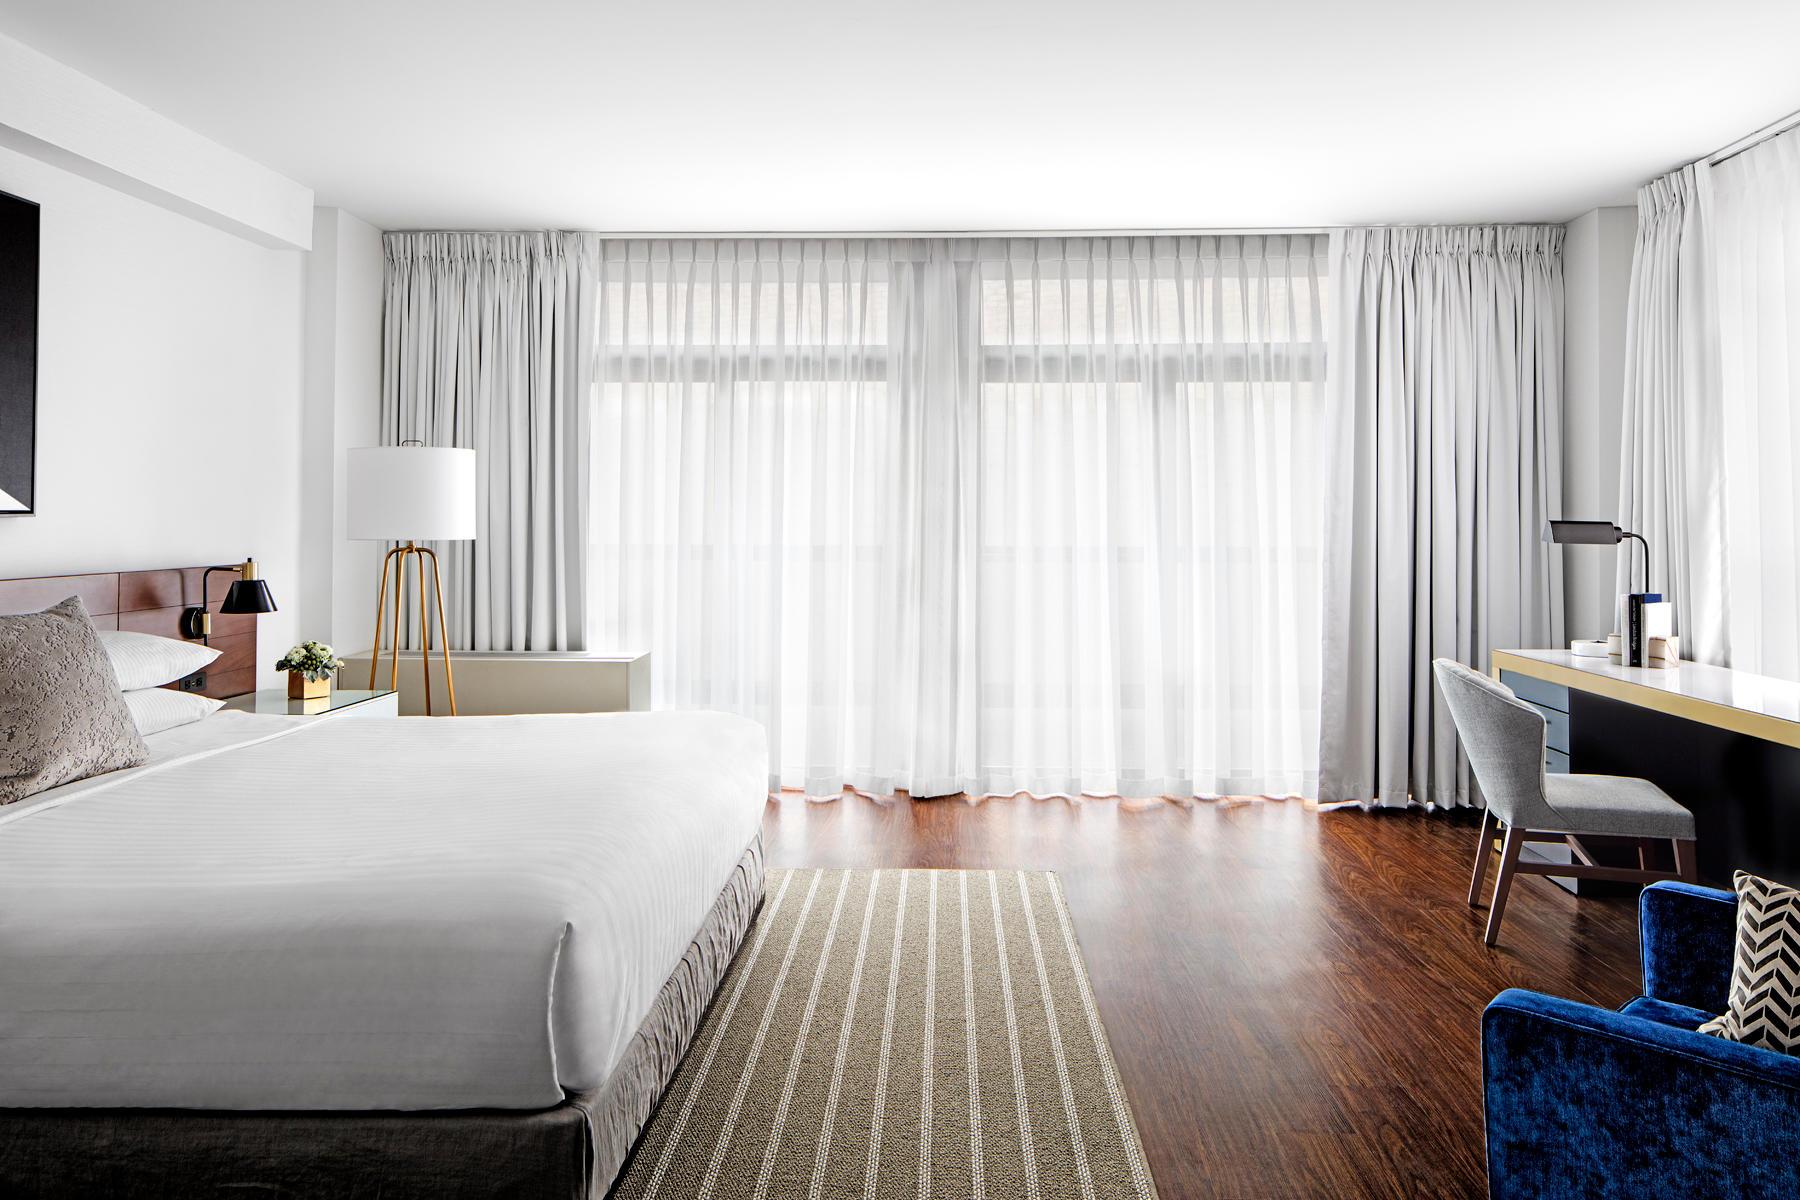 St. Gregory Hotel Dupont Circle image 17